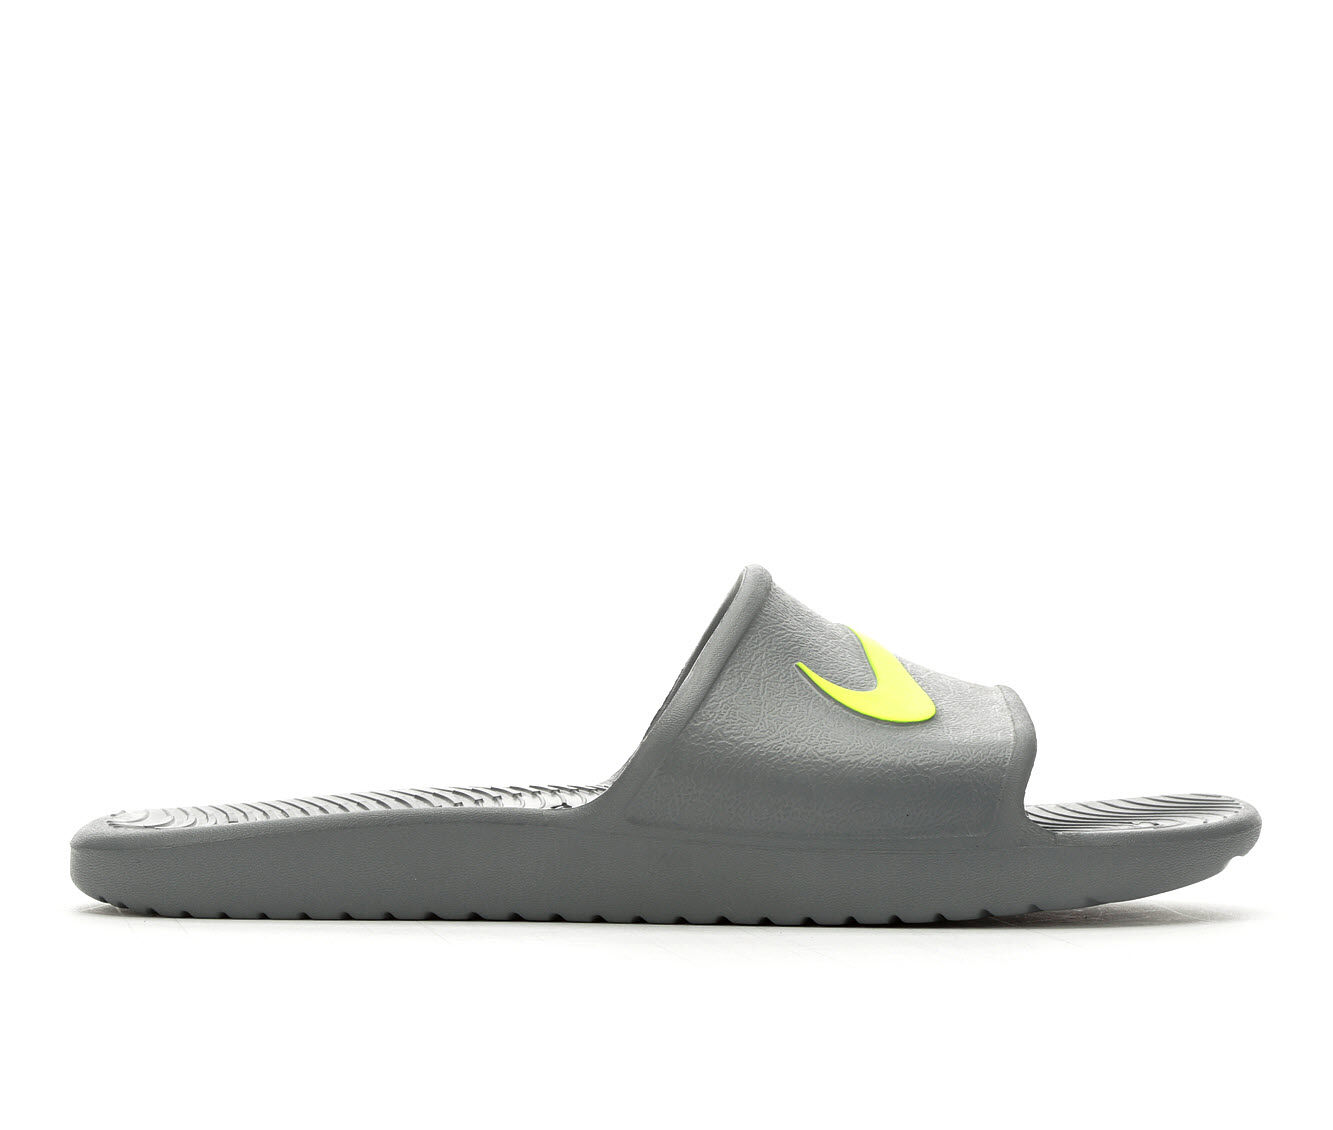 uk shoes_kd2651